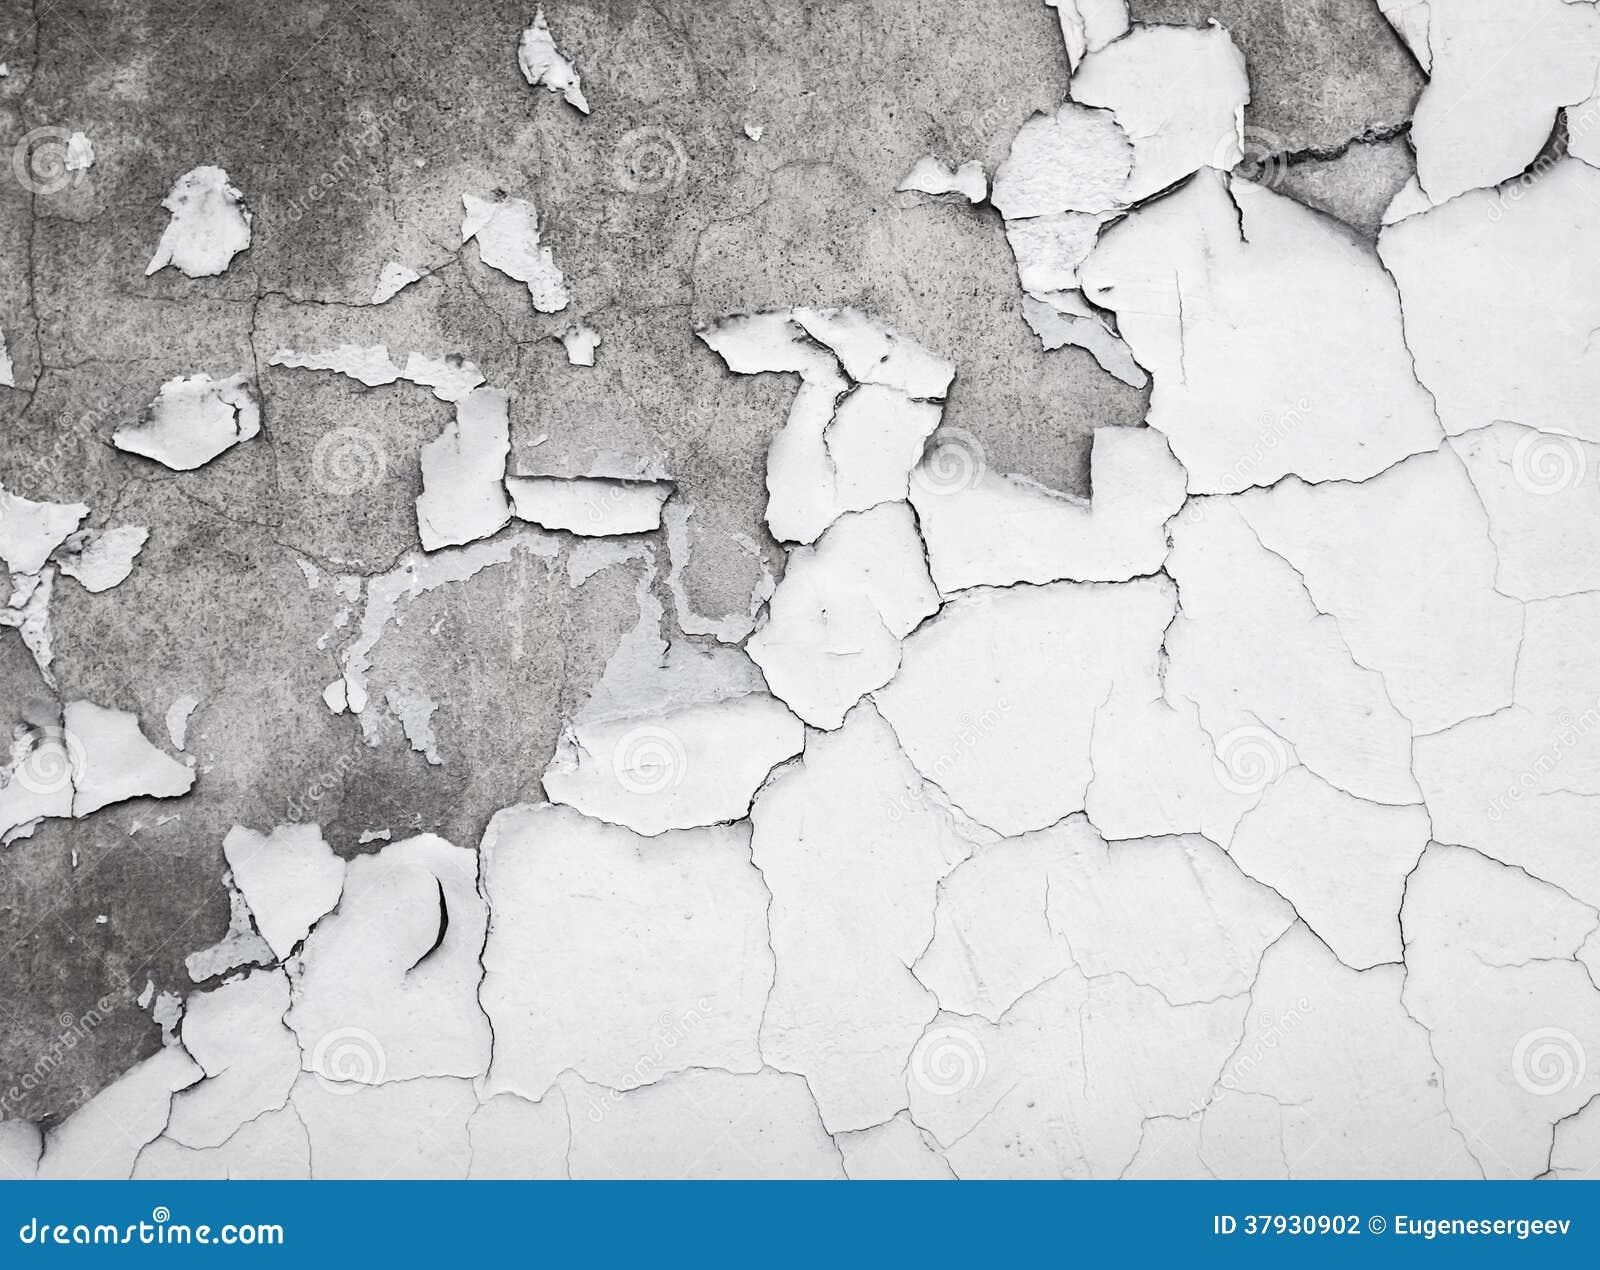 Текстура треснутой краски на бетонной стене